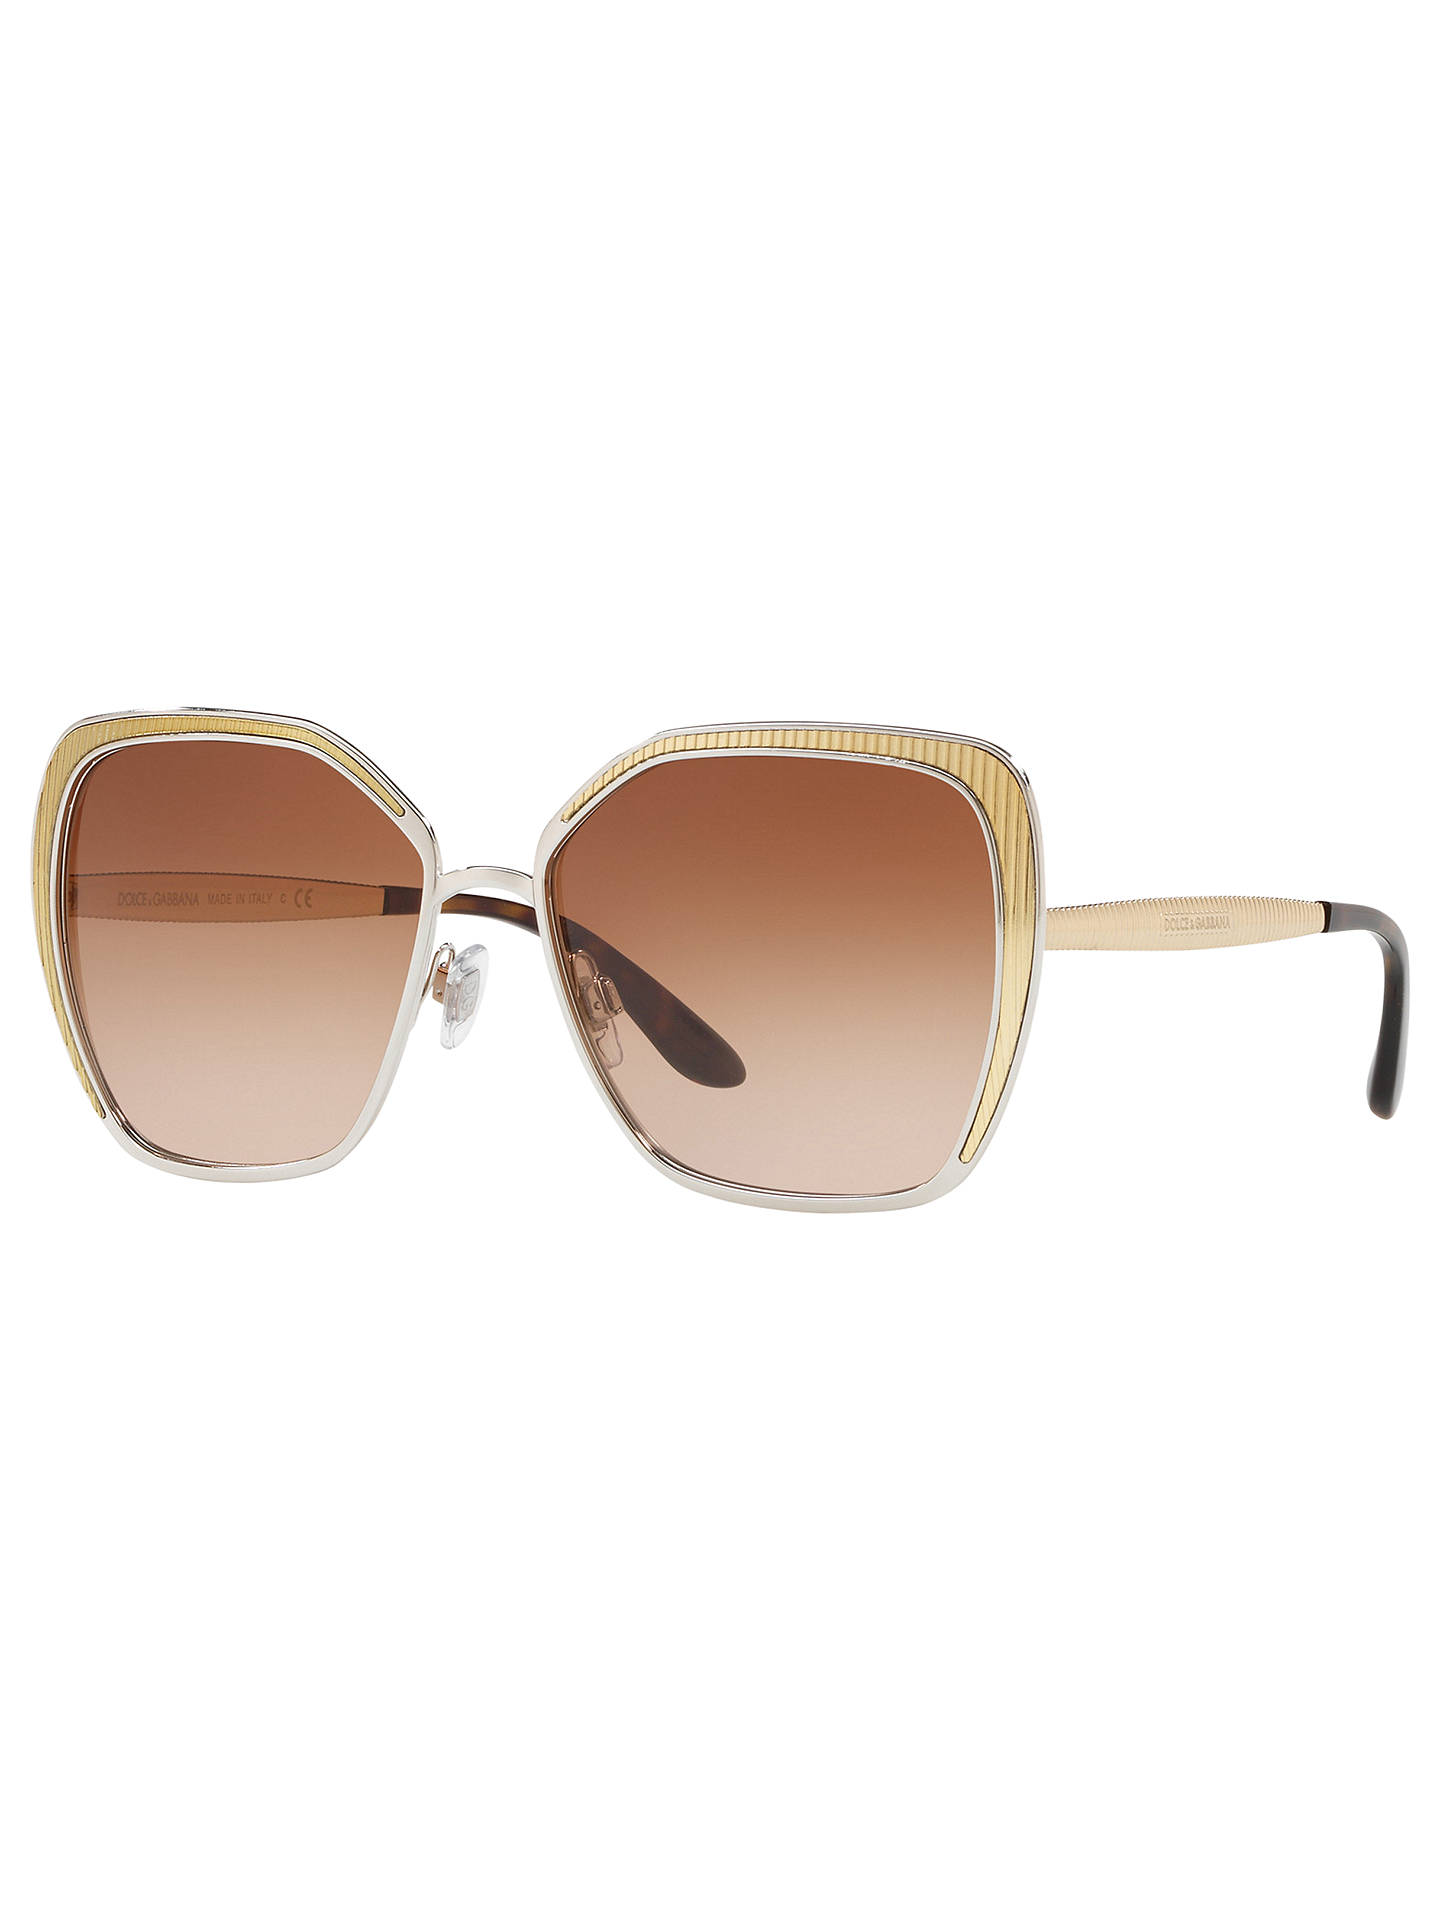 64bc609de026 Dolce   Gabbana DG2197 Women s Geometric Sunglasses at John Lewis ...